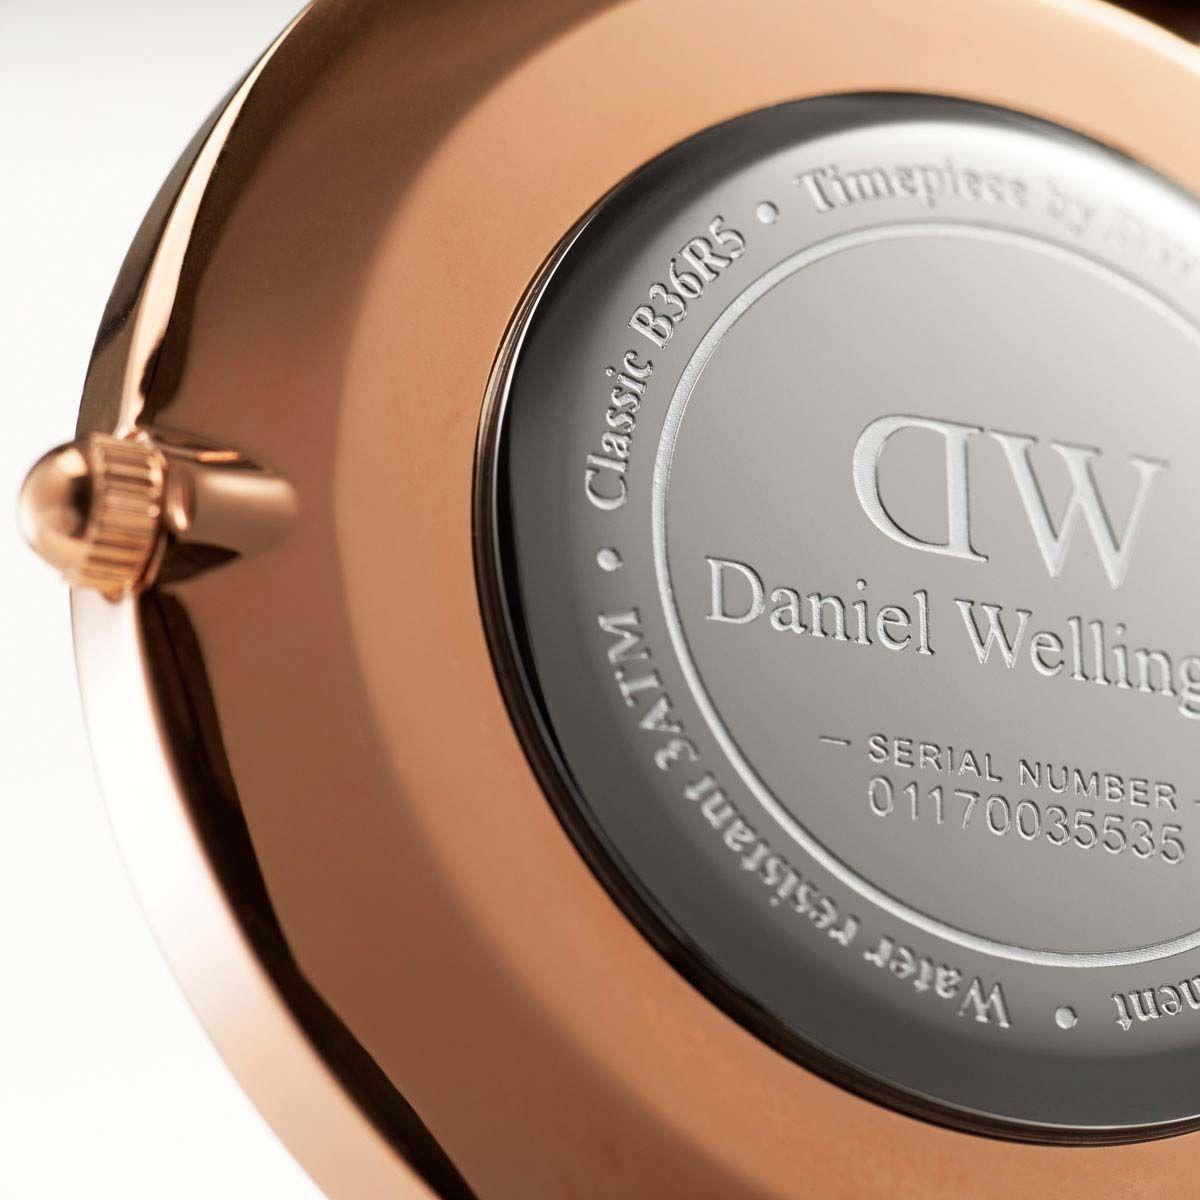 dw官网 dw手表官网 dw中国官网 dw官方旗舰店 DW DW官网  W Classic St Mawes RG 40mm